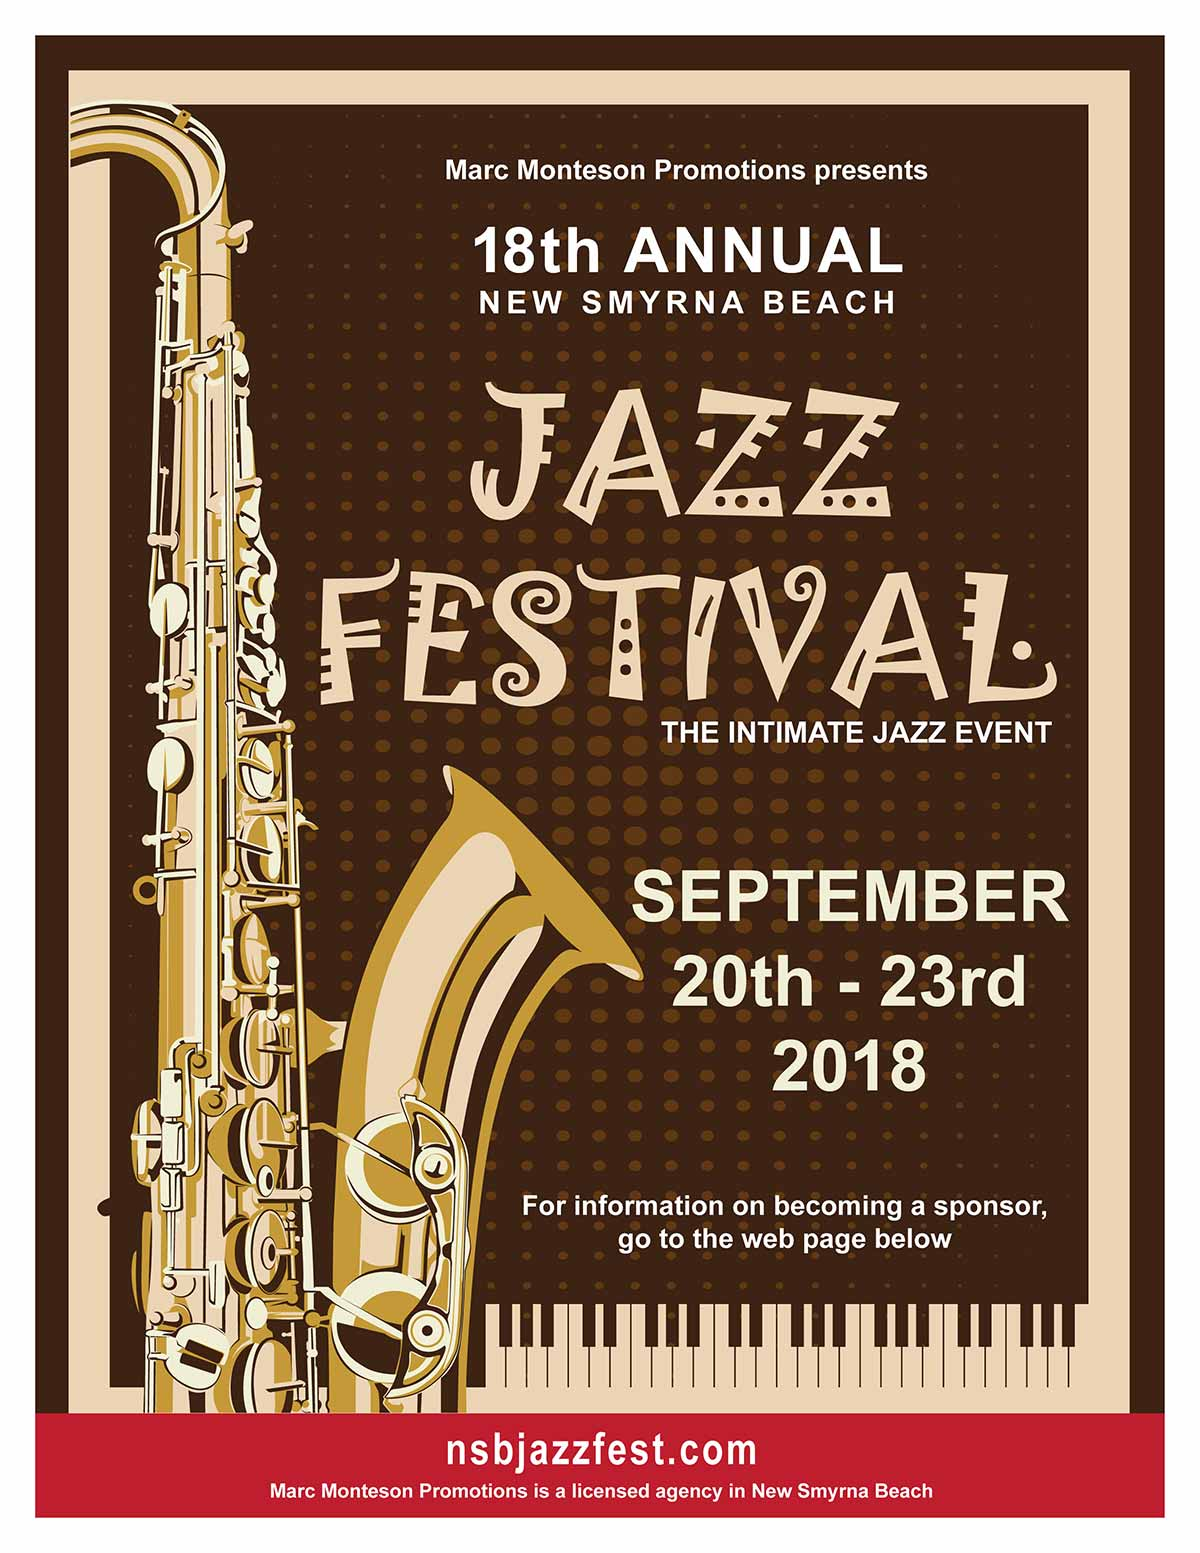 Jazz-Fest-Promo-2018